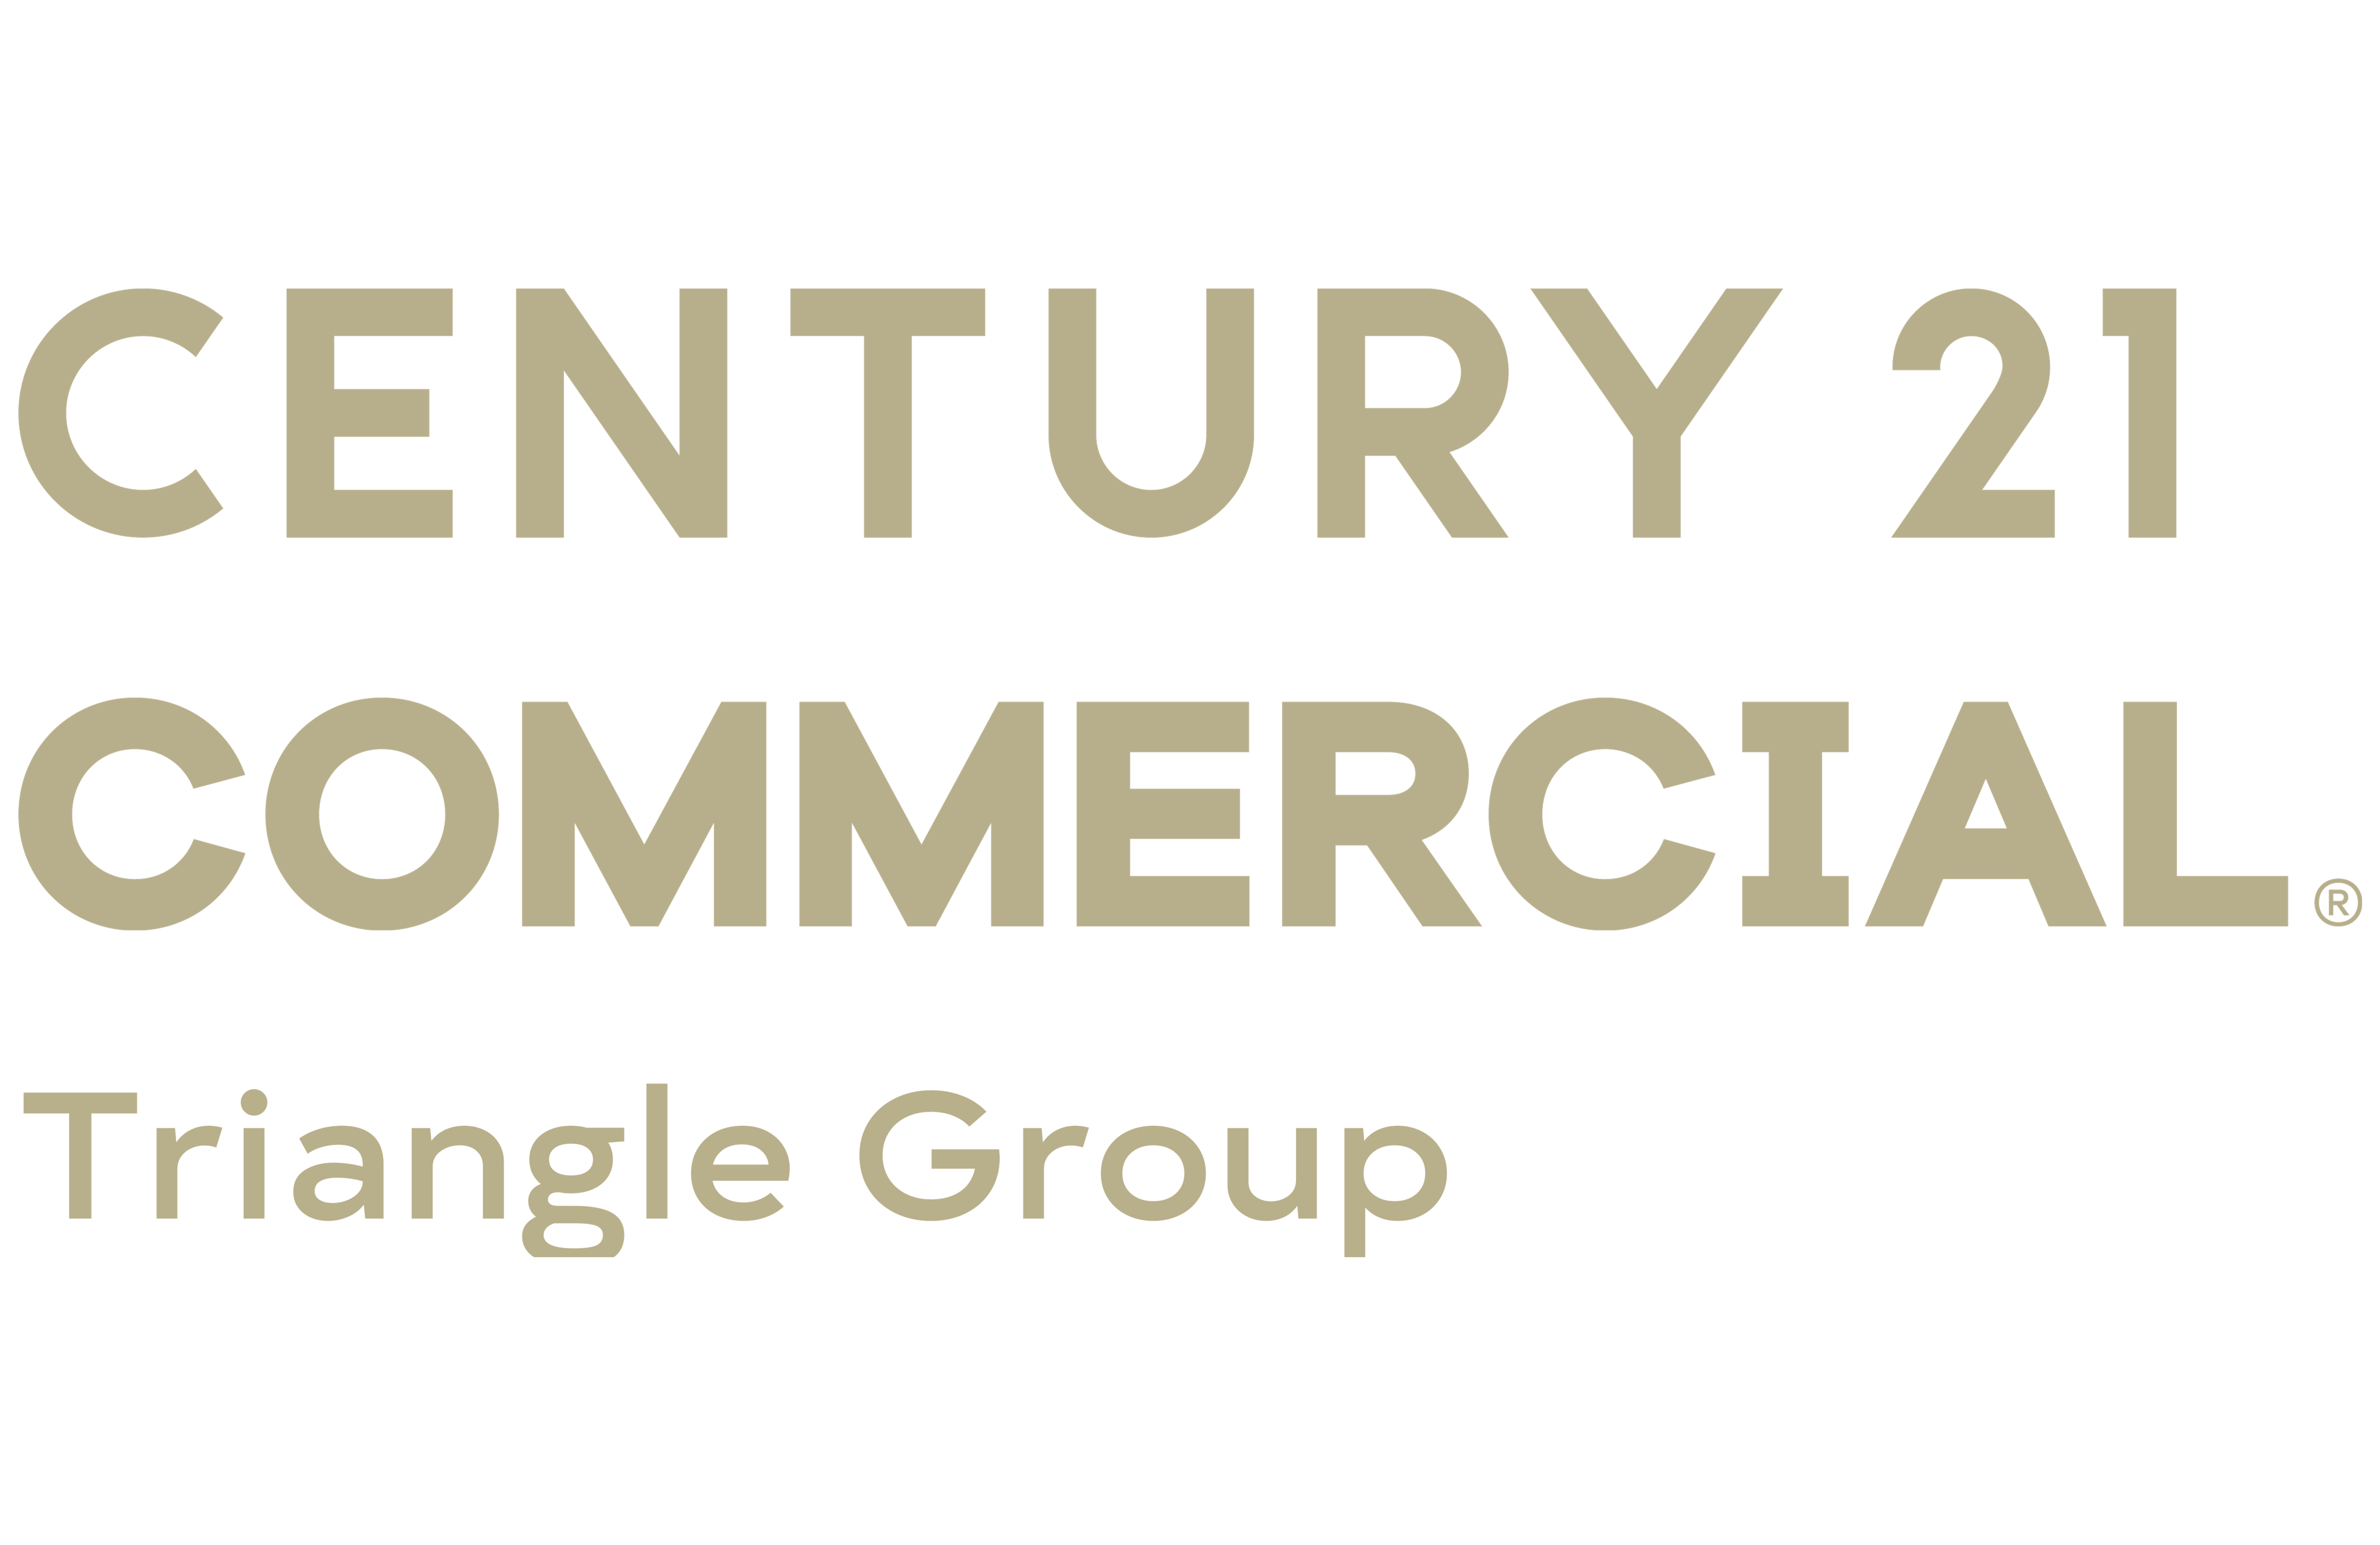 Paul Smith of CENTURY 21 Triangle Group logo